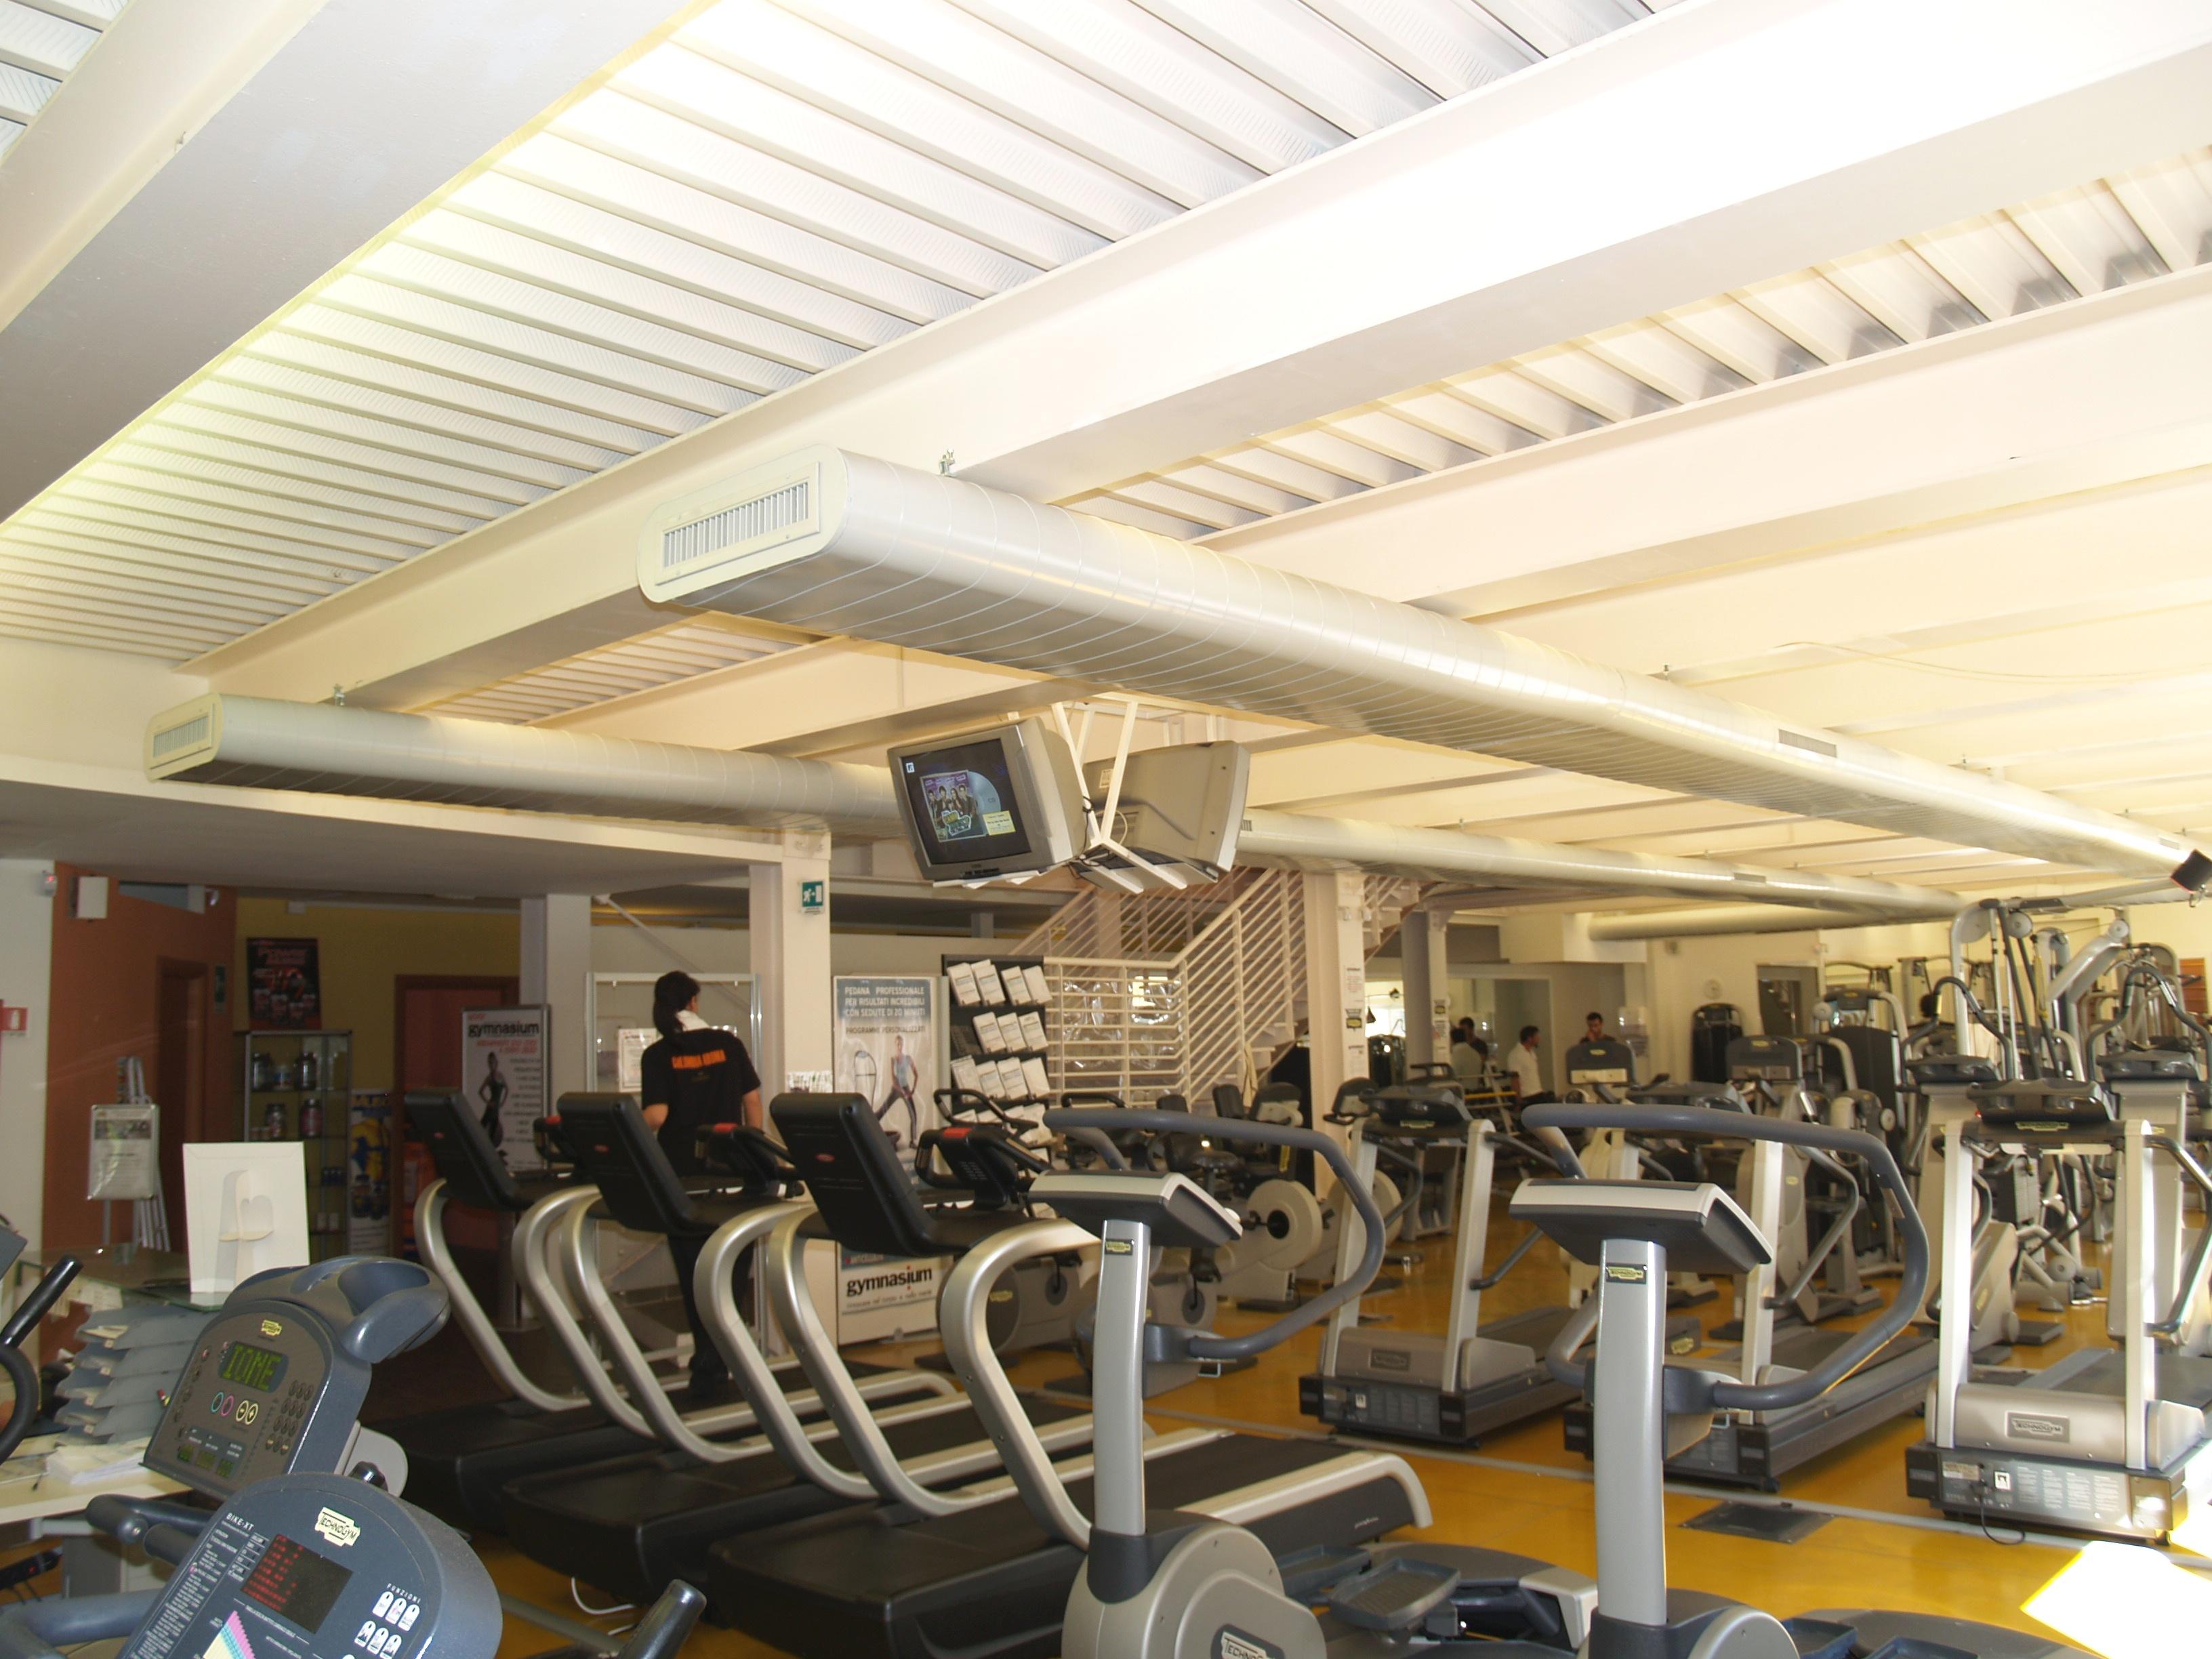 Centro fitness ravenna for Centro fitness